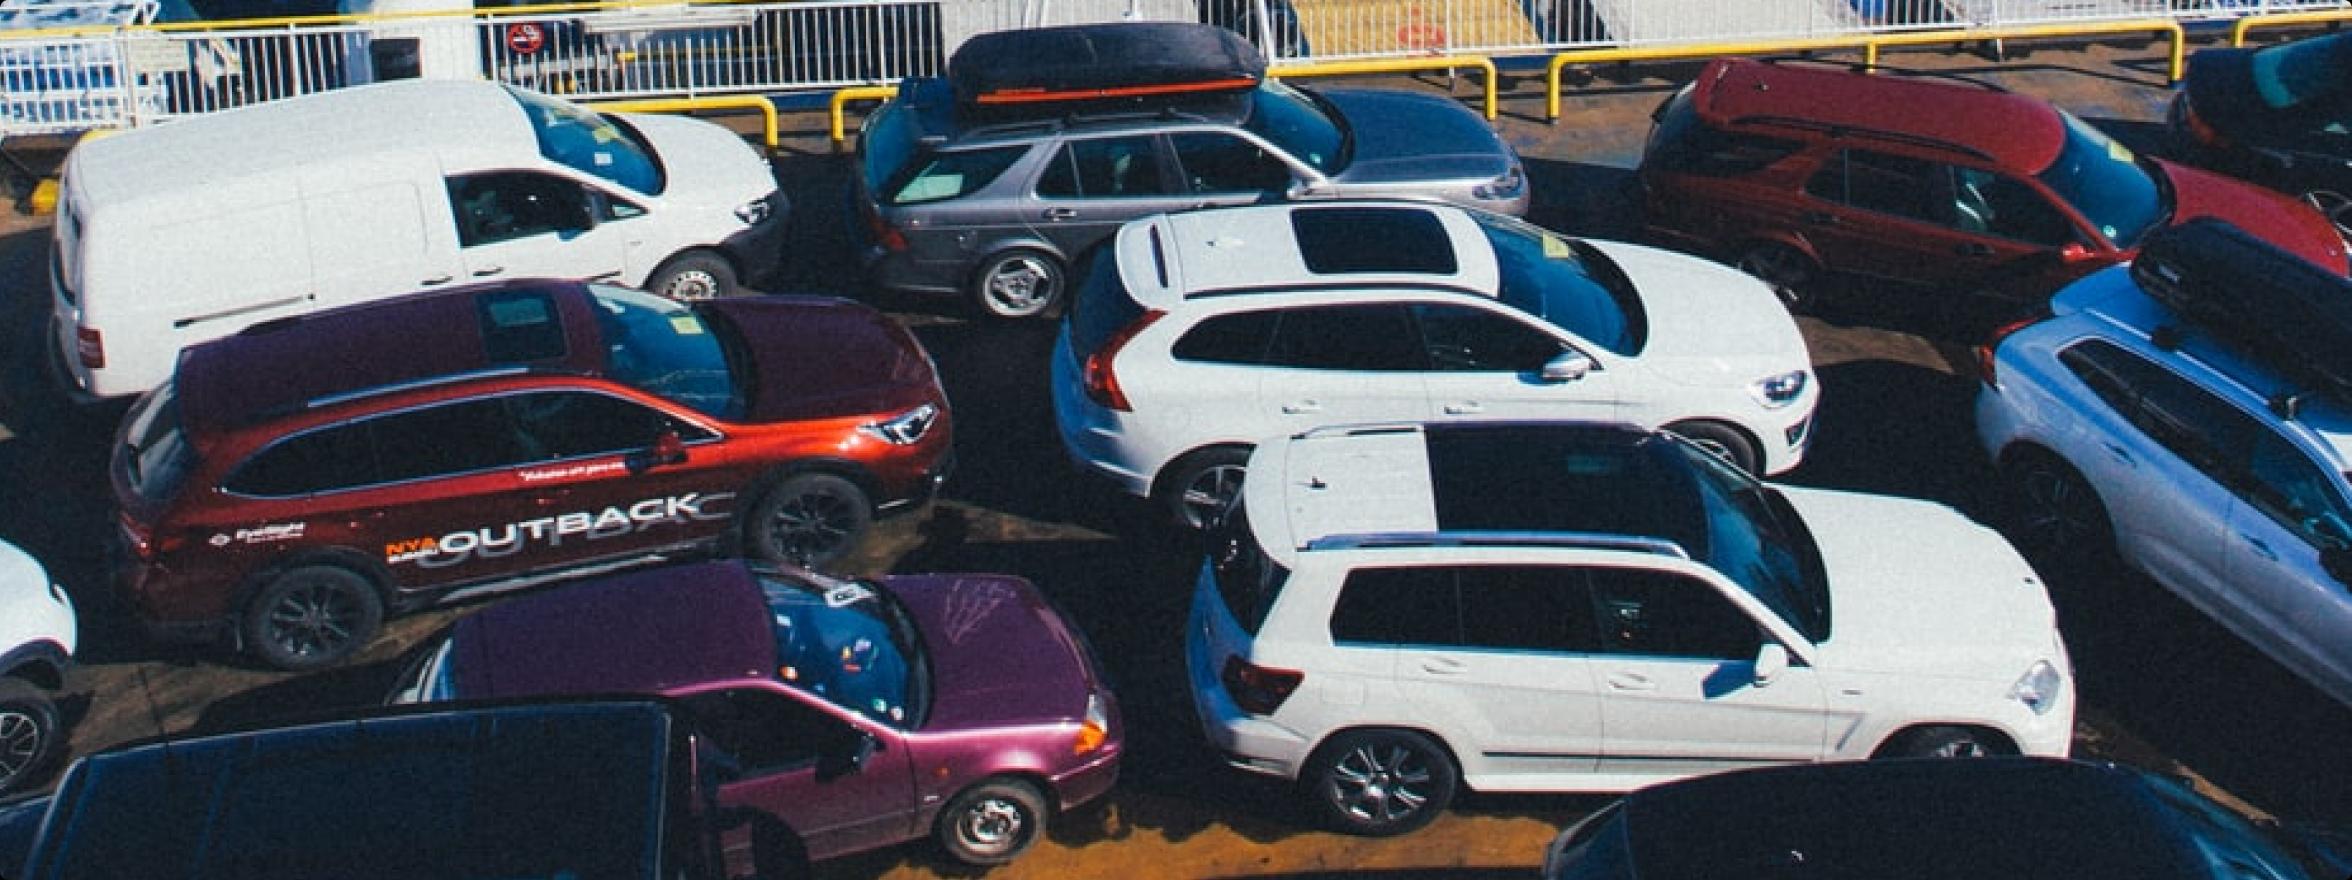 https://www.carshipguru.com/wordpress/wp-content/uploads/2021/09/cost-to-ship-a-car-by-size.png